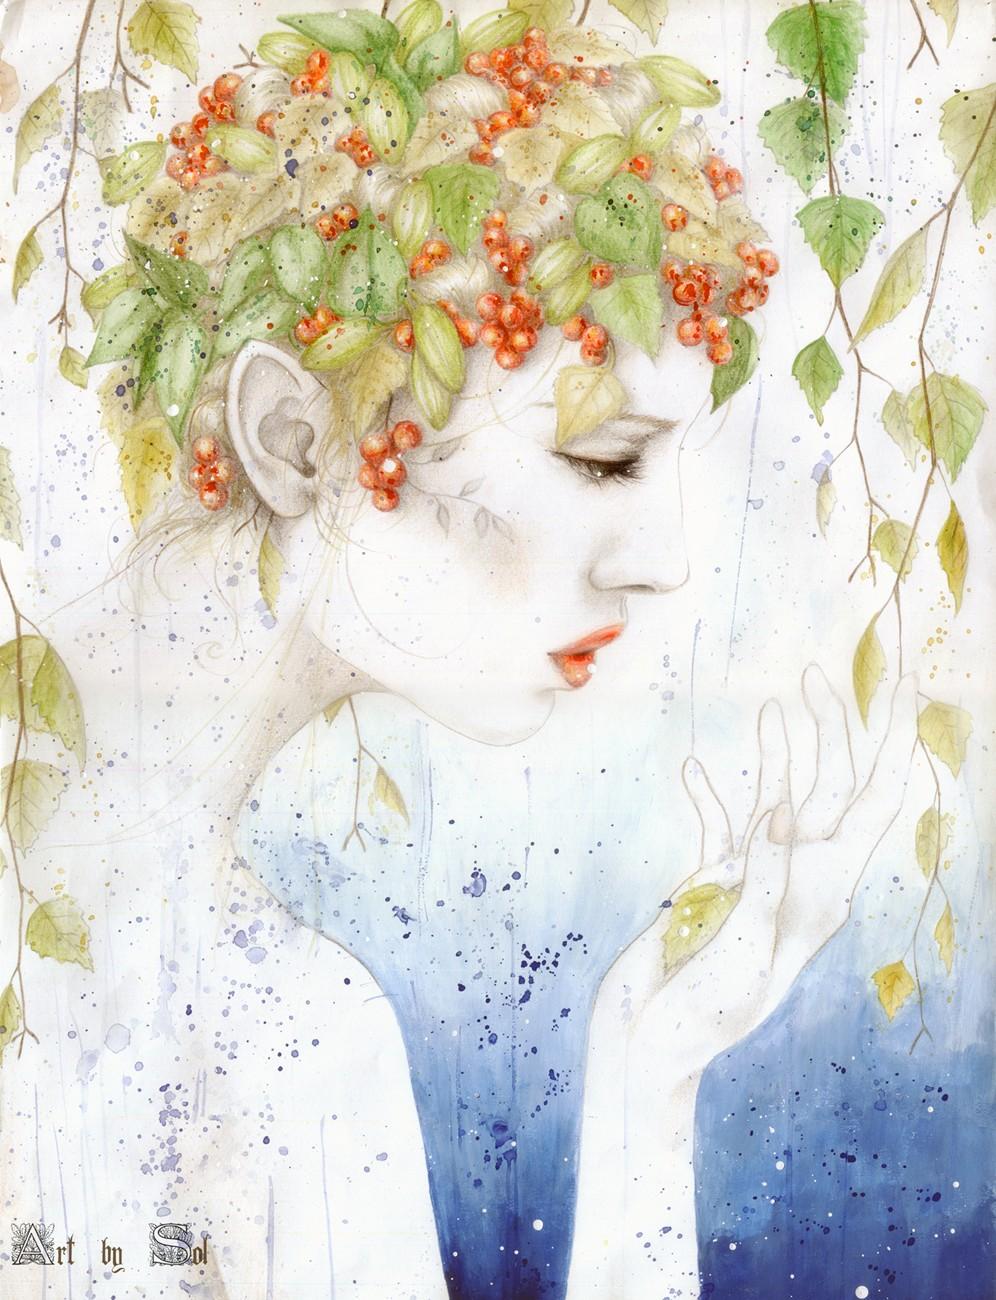 Rain of leaves - Sol Angelica